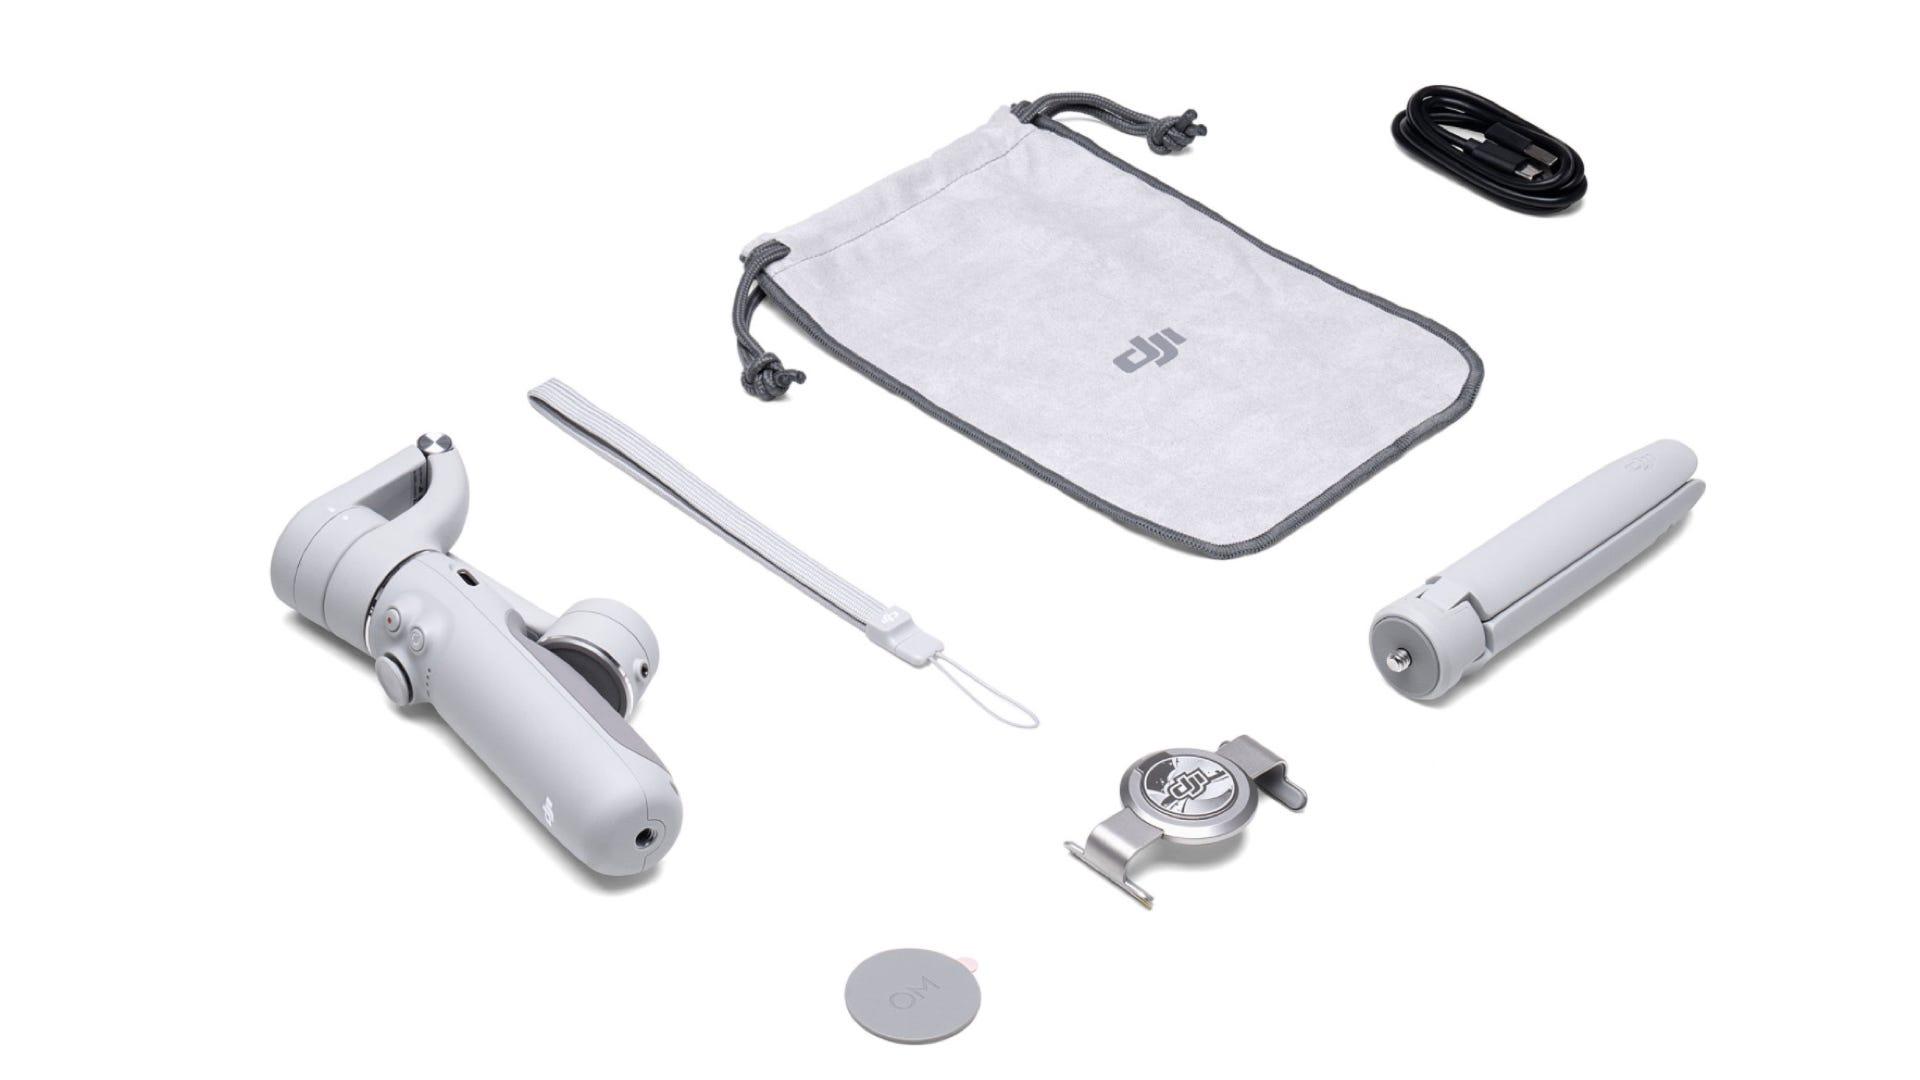 DJI Osmos 5 accessories